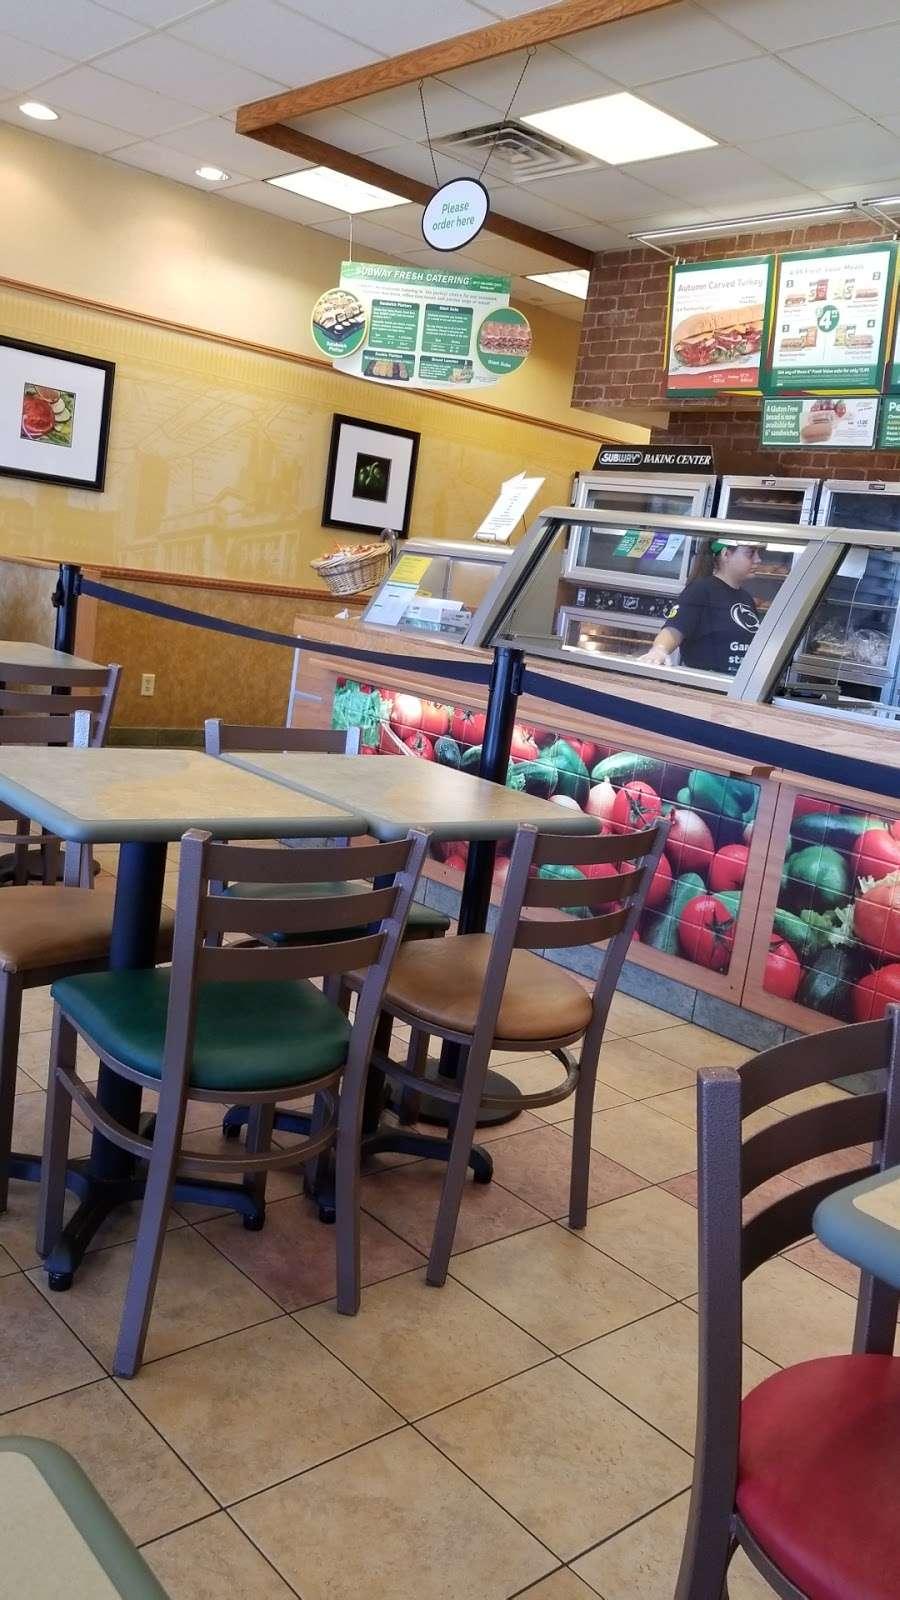 Subway - restaurant  | Photo 6 of 7 | Address: 1380 Columbia Ave, Lancaster, PA 17603, USA | Phone: (717) 735-0626